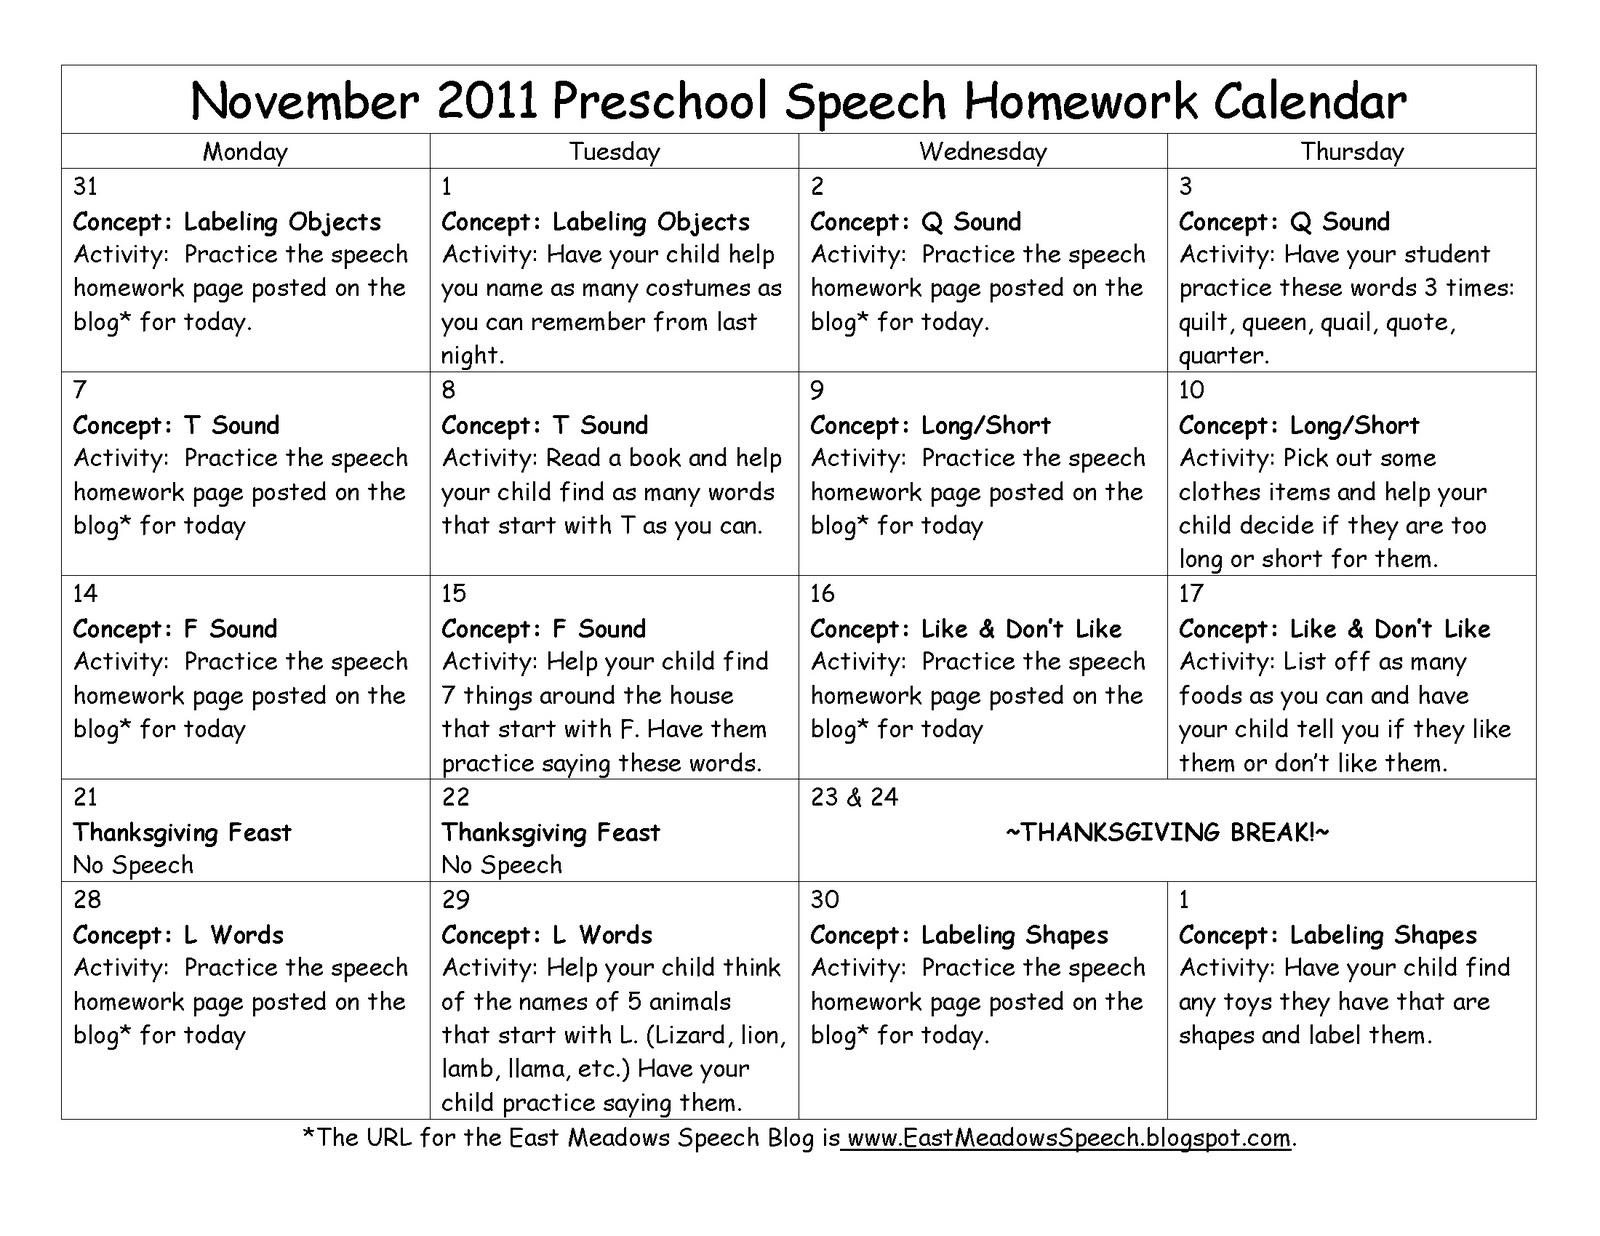 Kindergarten November Calendar : Preschool homework calendars